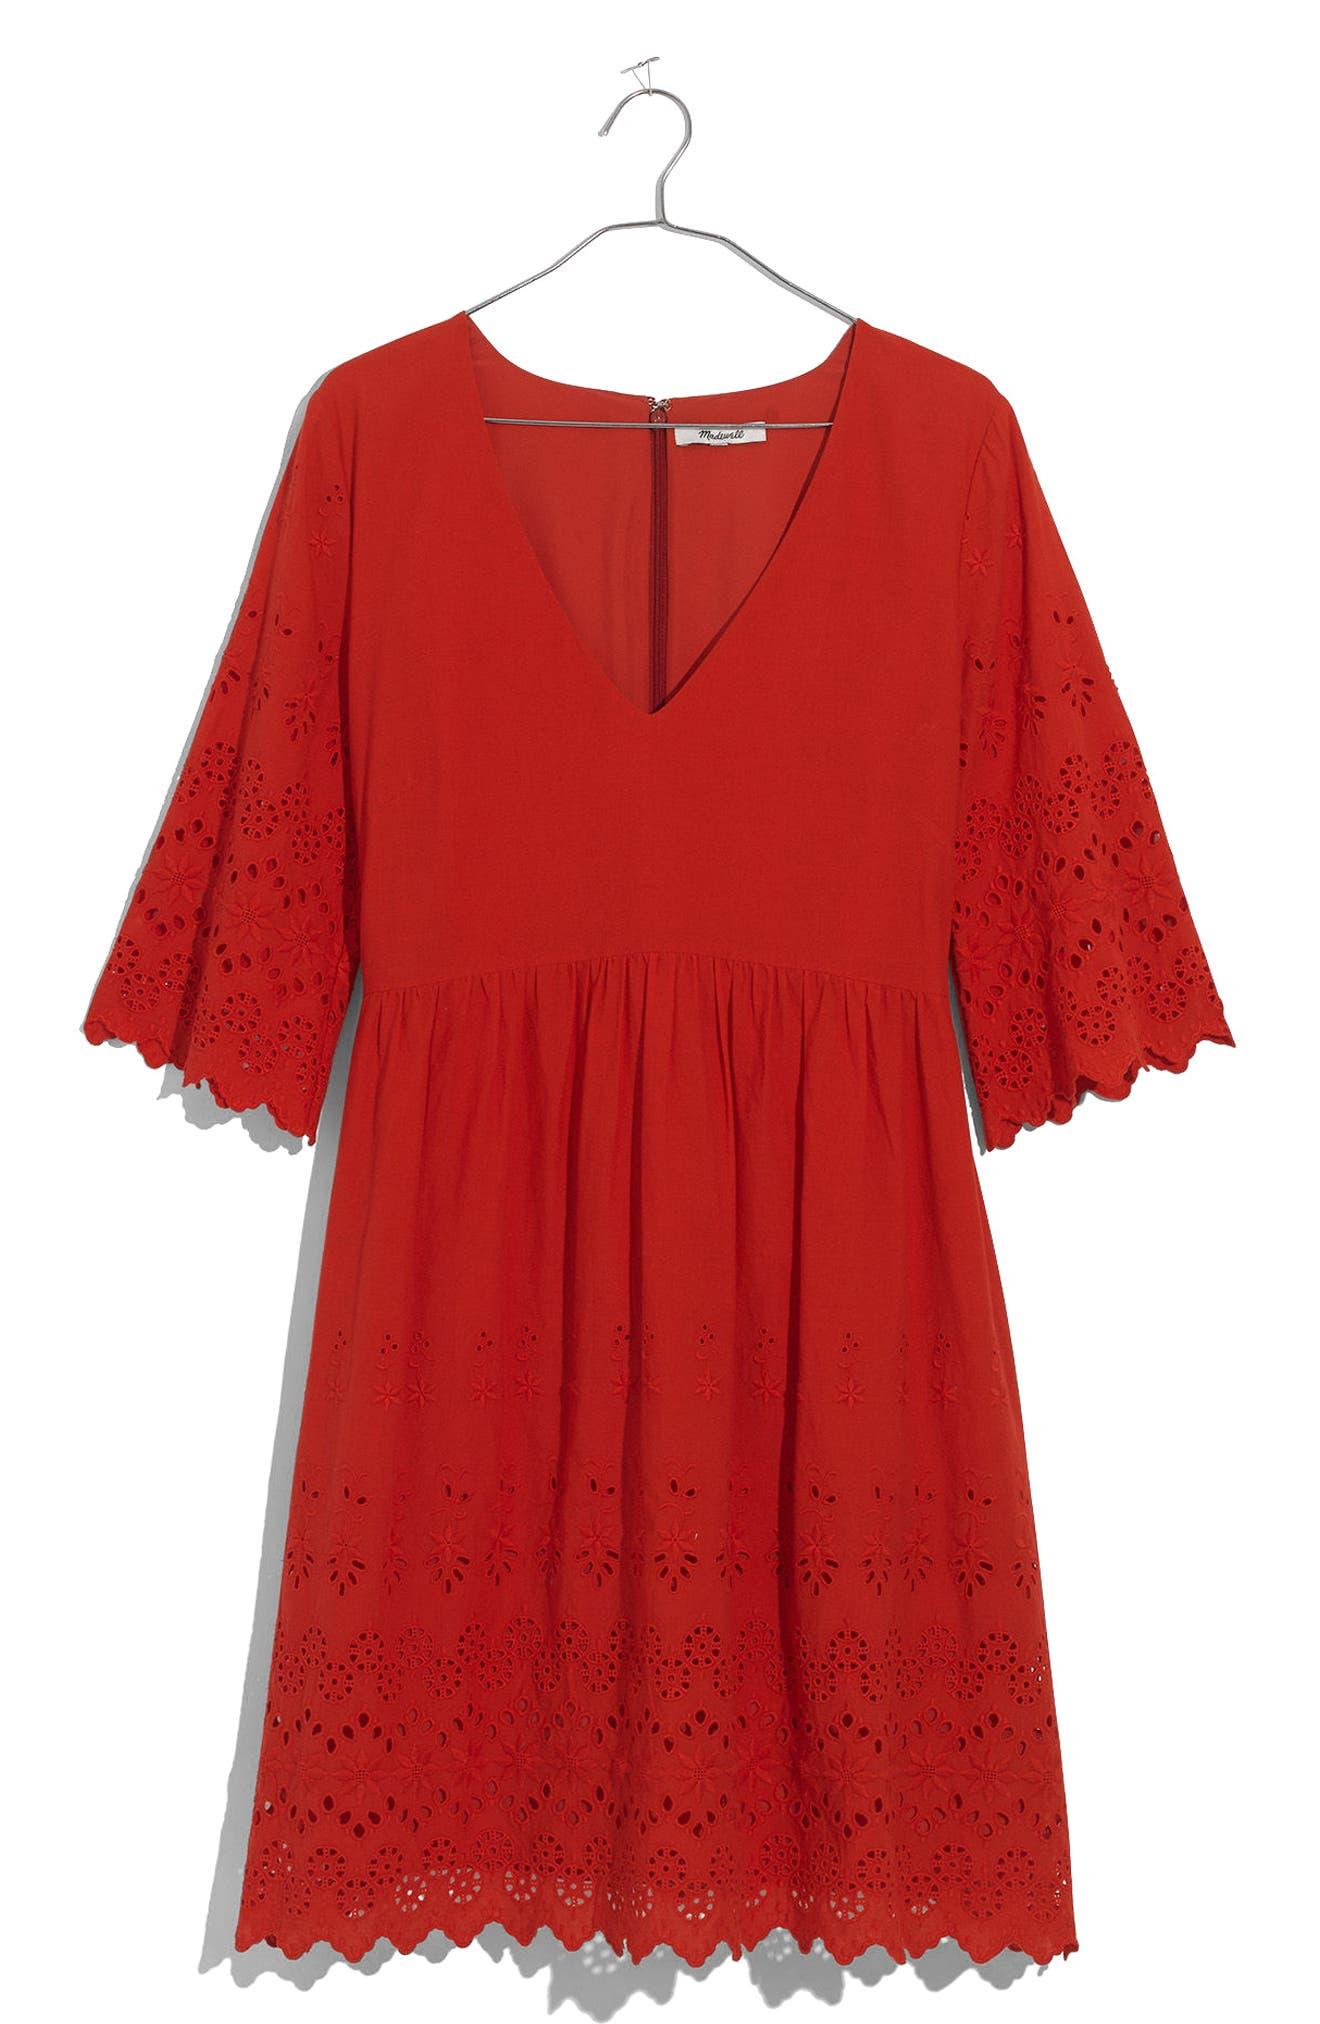 Eyelet Lattice Dress,                             Alternate thumbnail 4, color,                             Bright Poppy